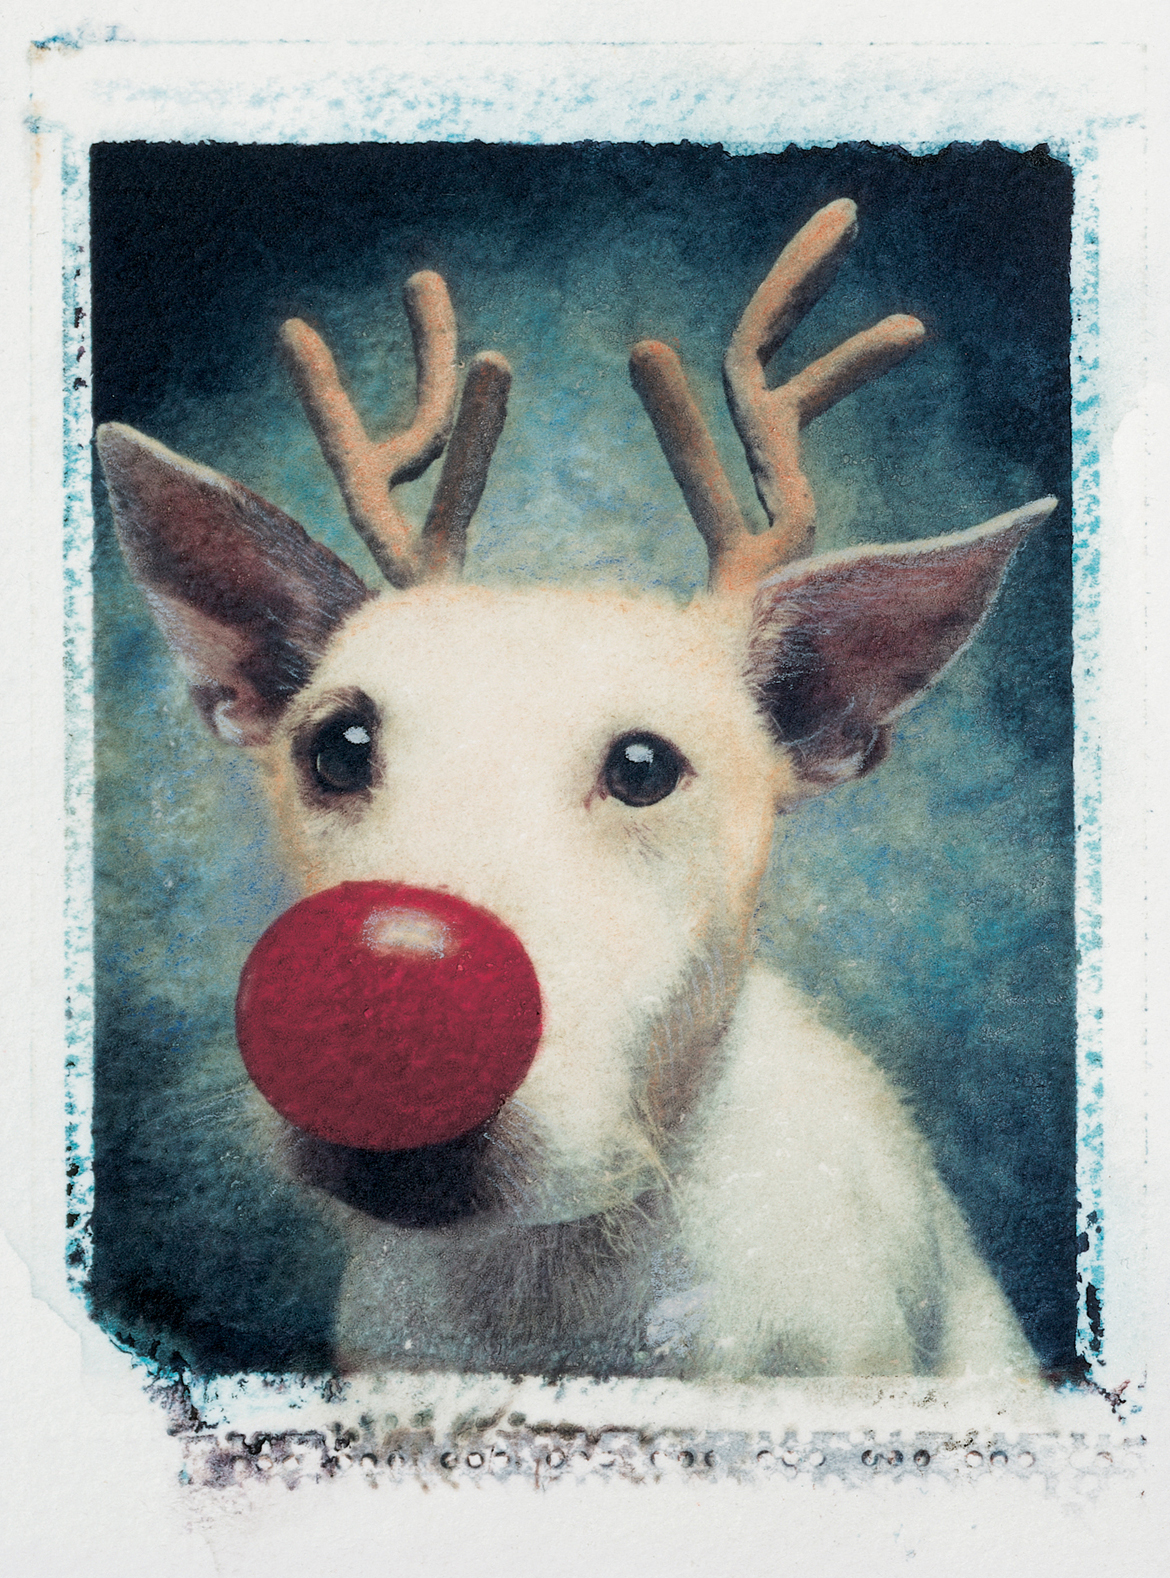 Rudolph 1990